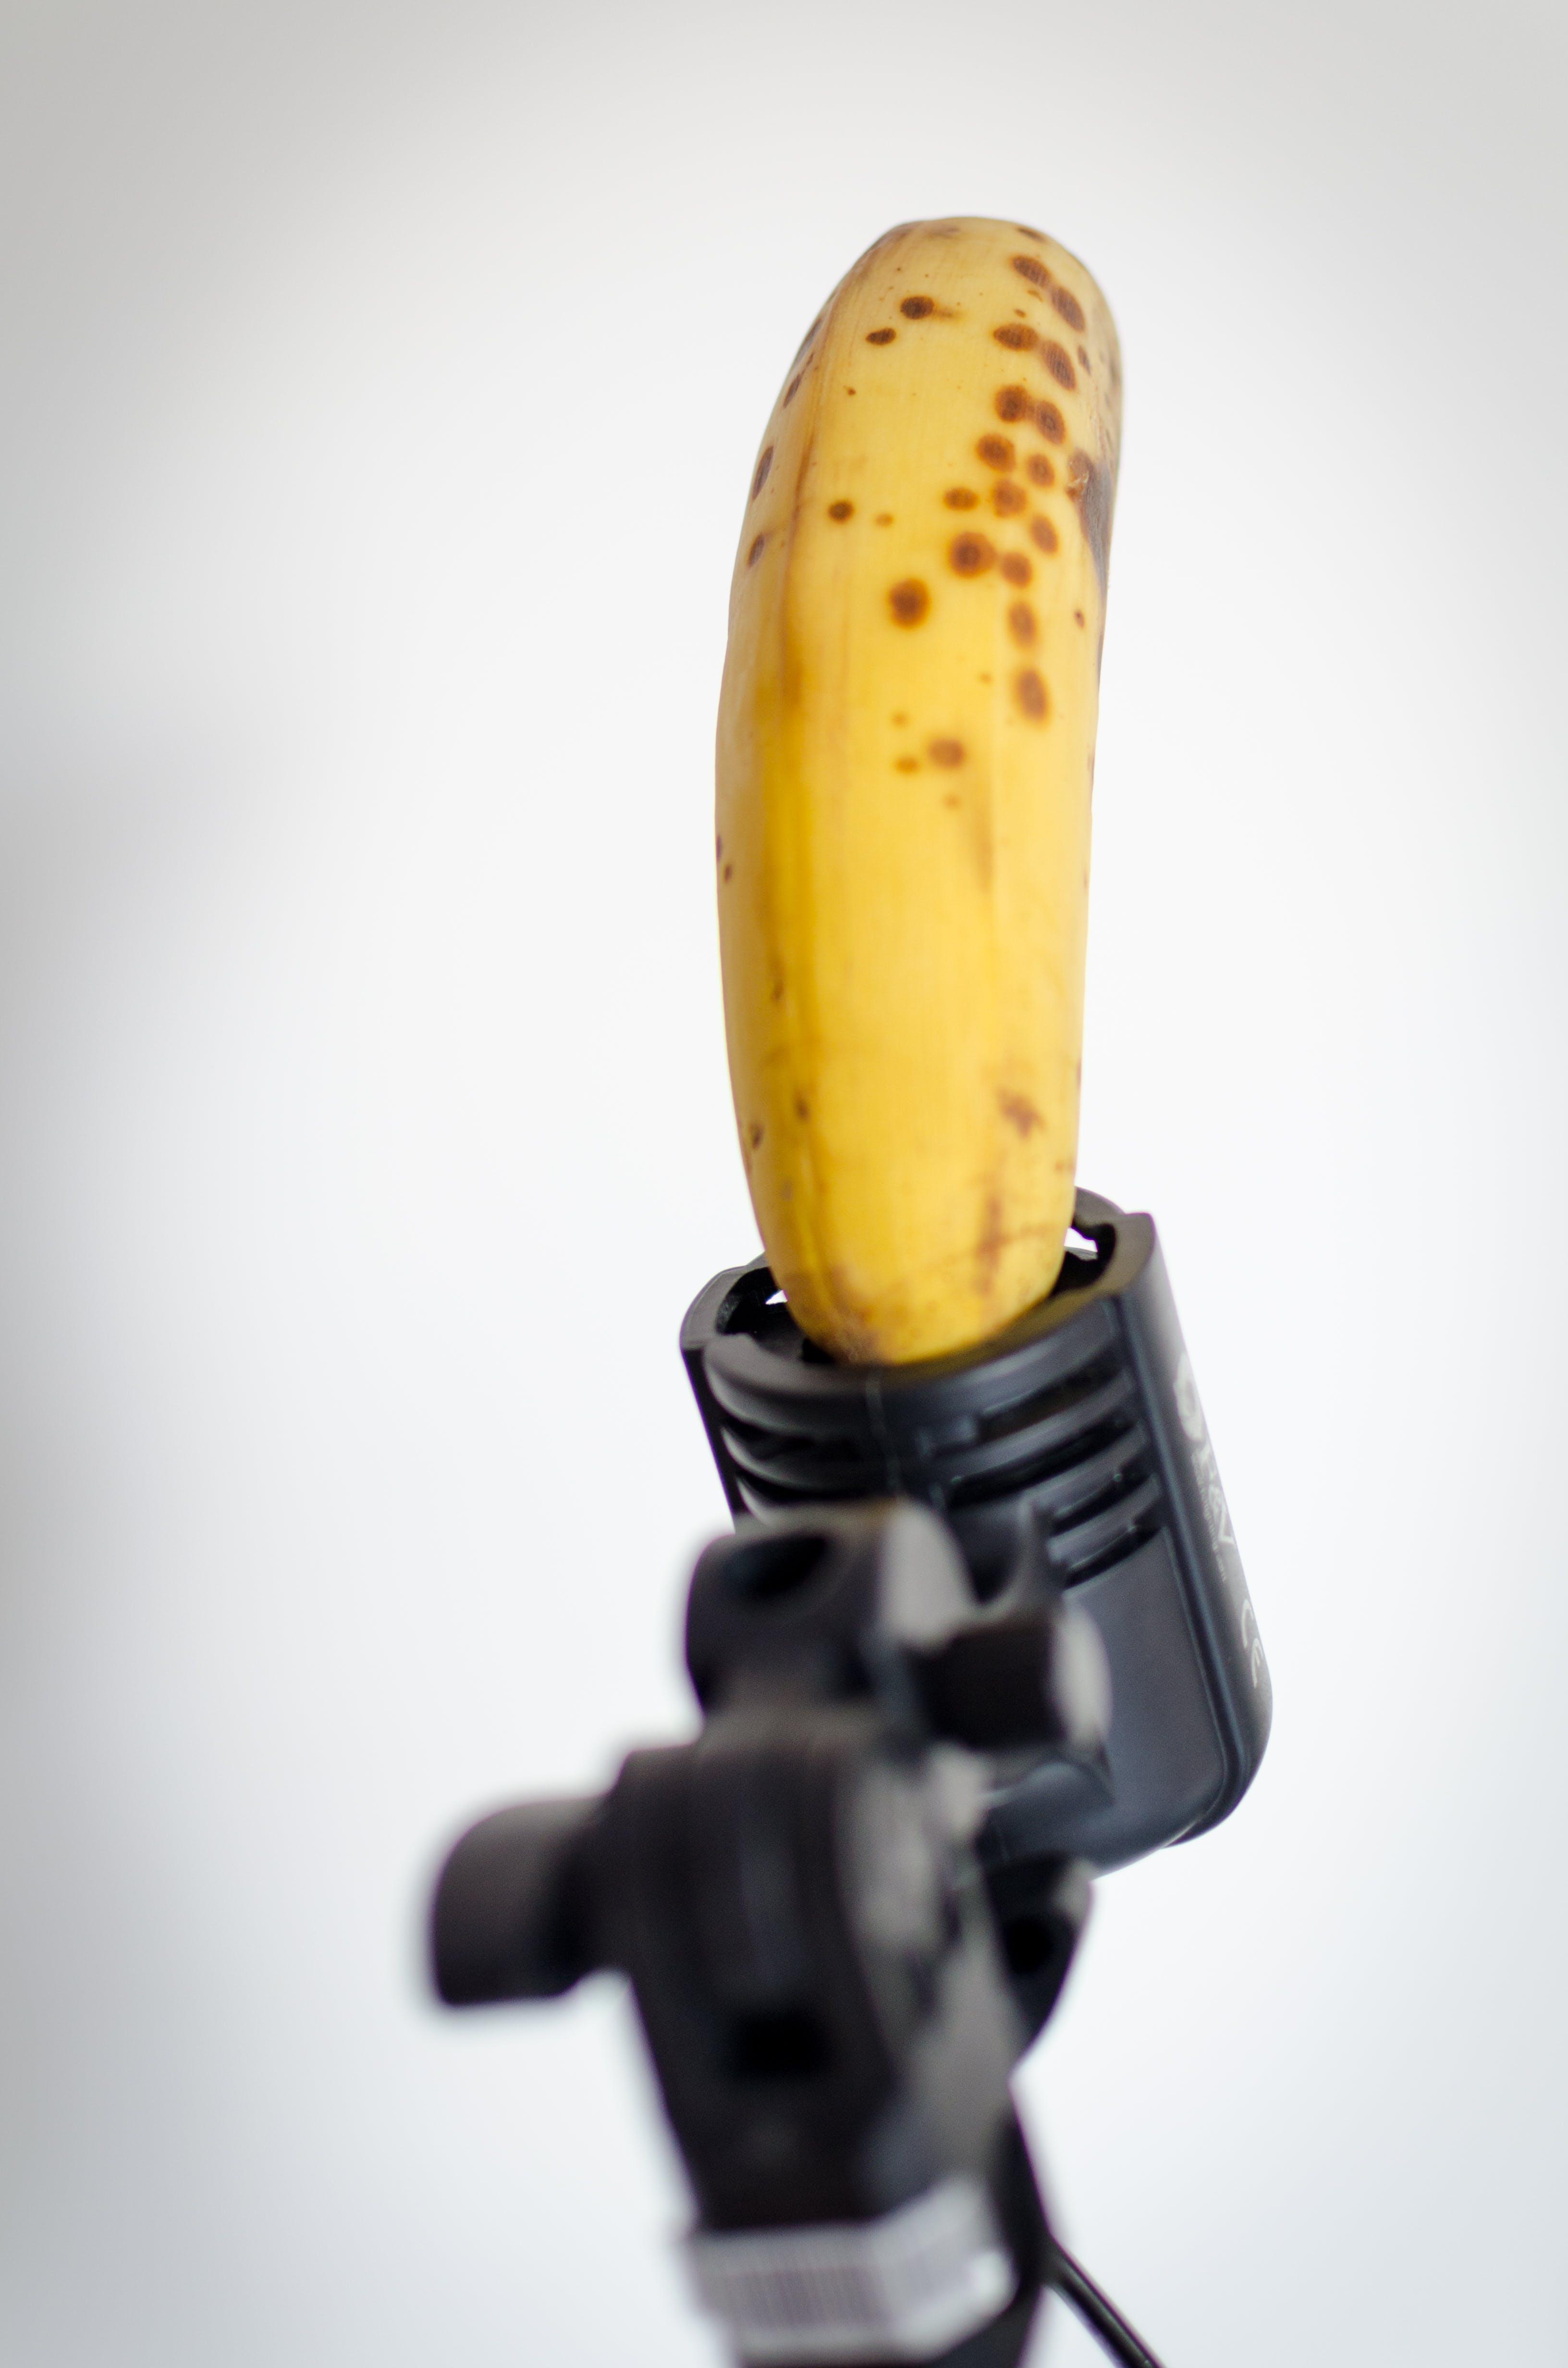 Free stock photo of light, yellow, photography, banana